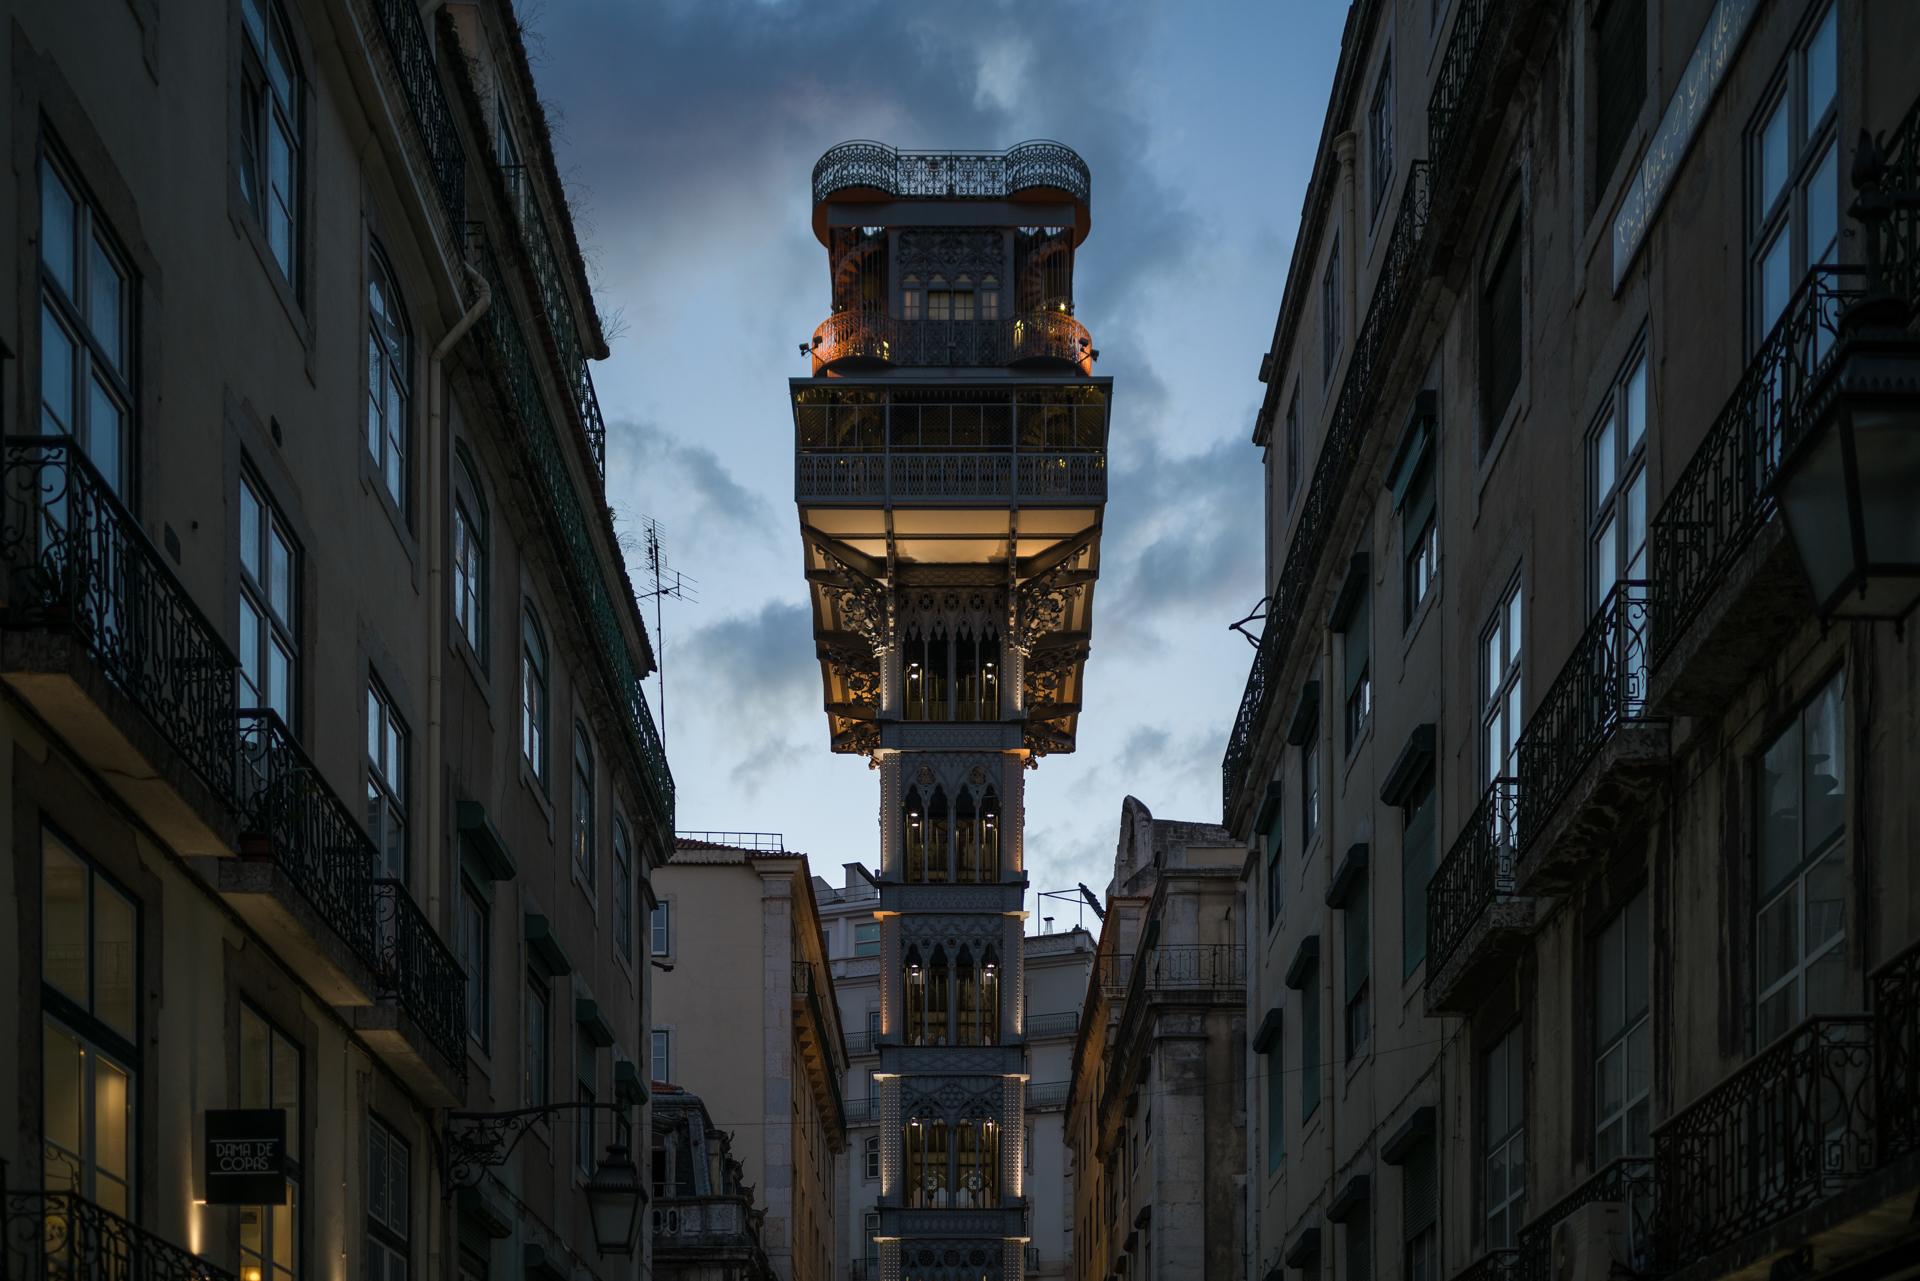 [Urban Architecture Photo]